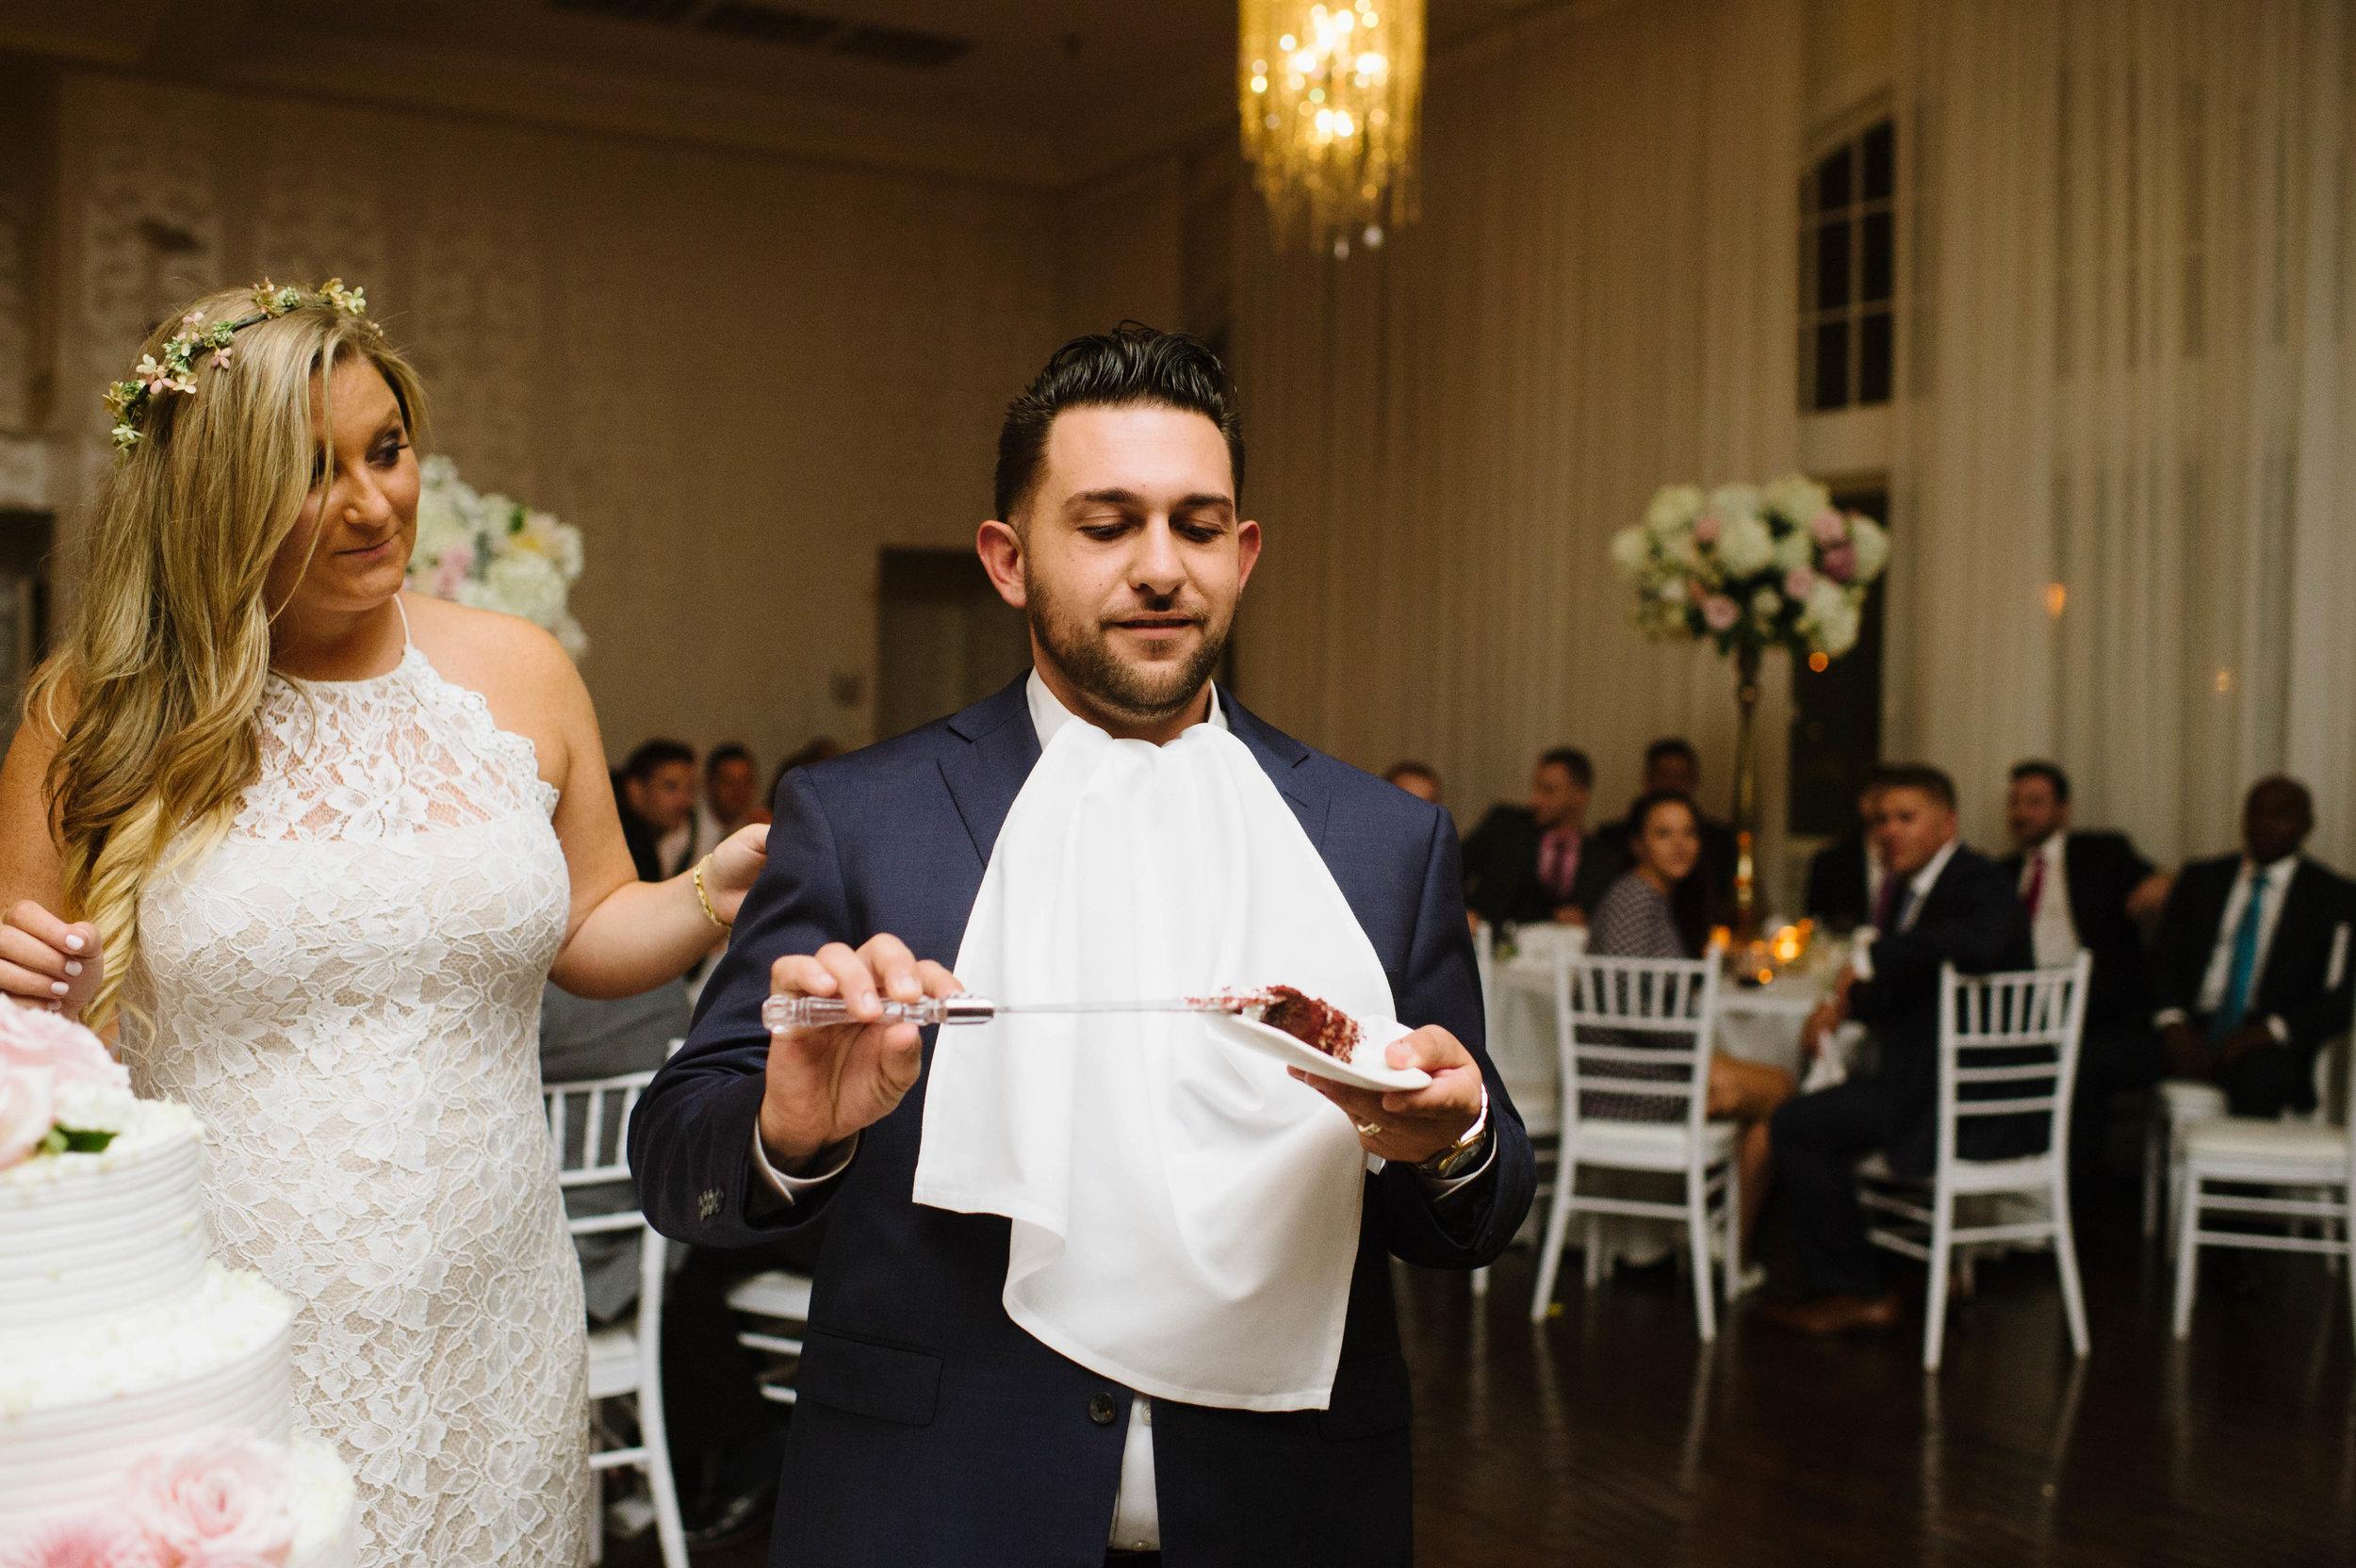 Documentary-Wedding-Photography-Newport021.jpg